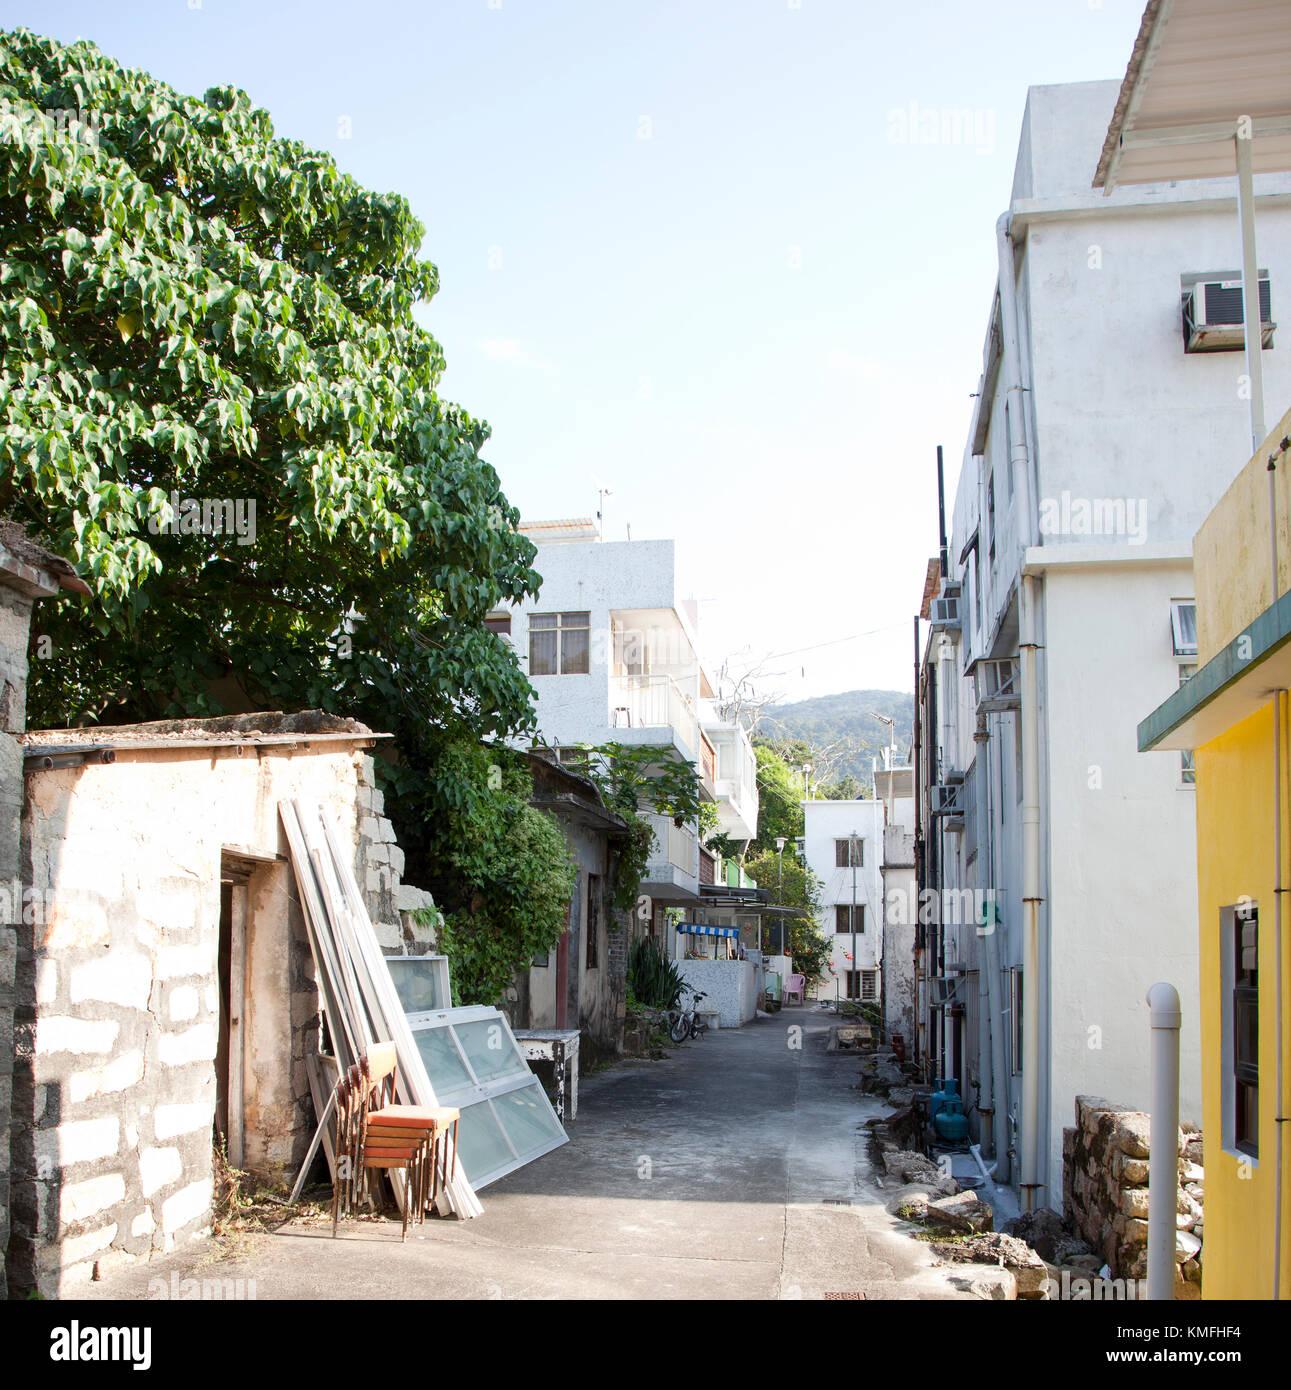 a rural back alley in a village on Lantau Island, Hong Kong - Stock Image